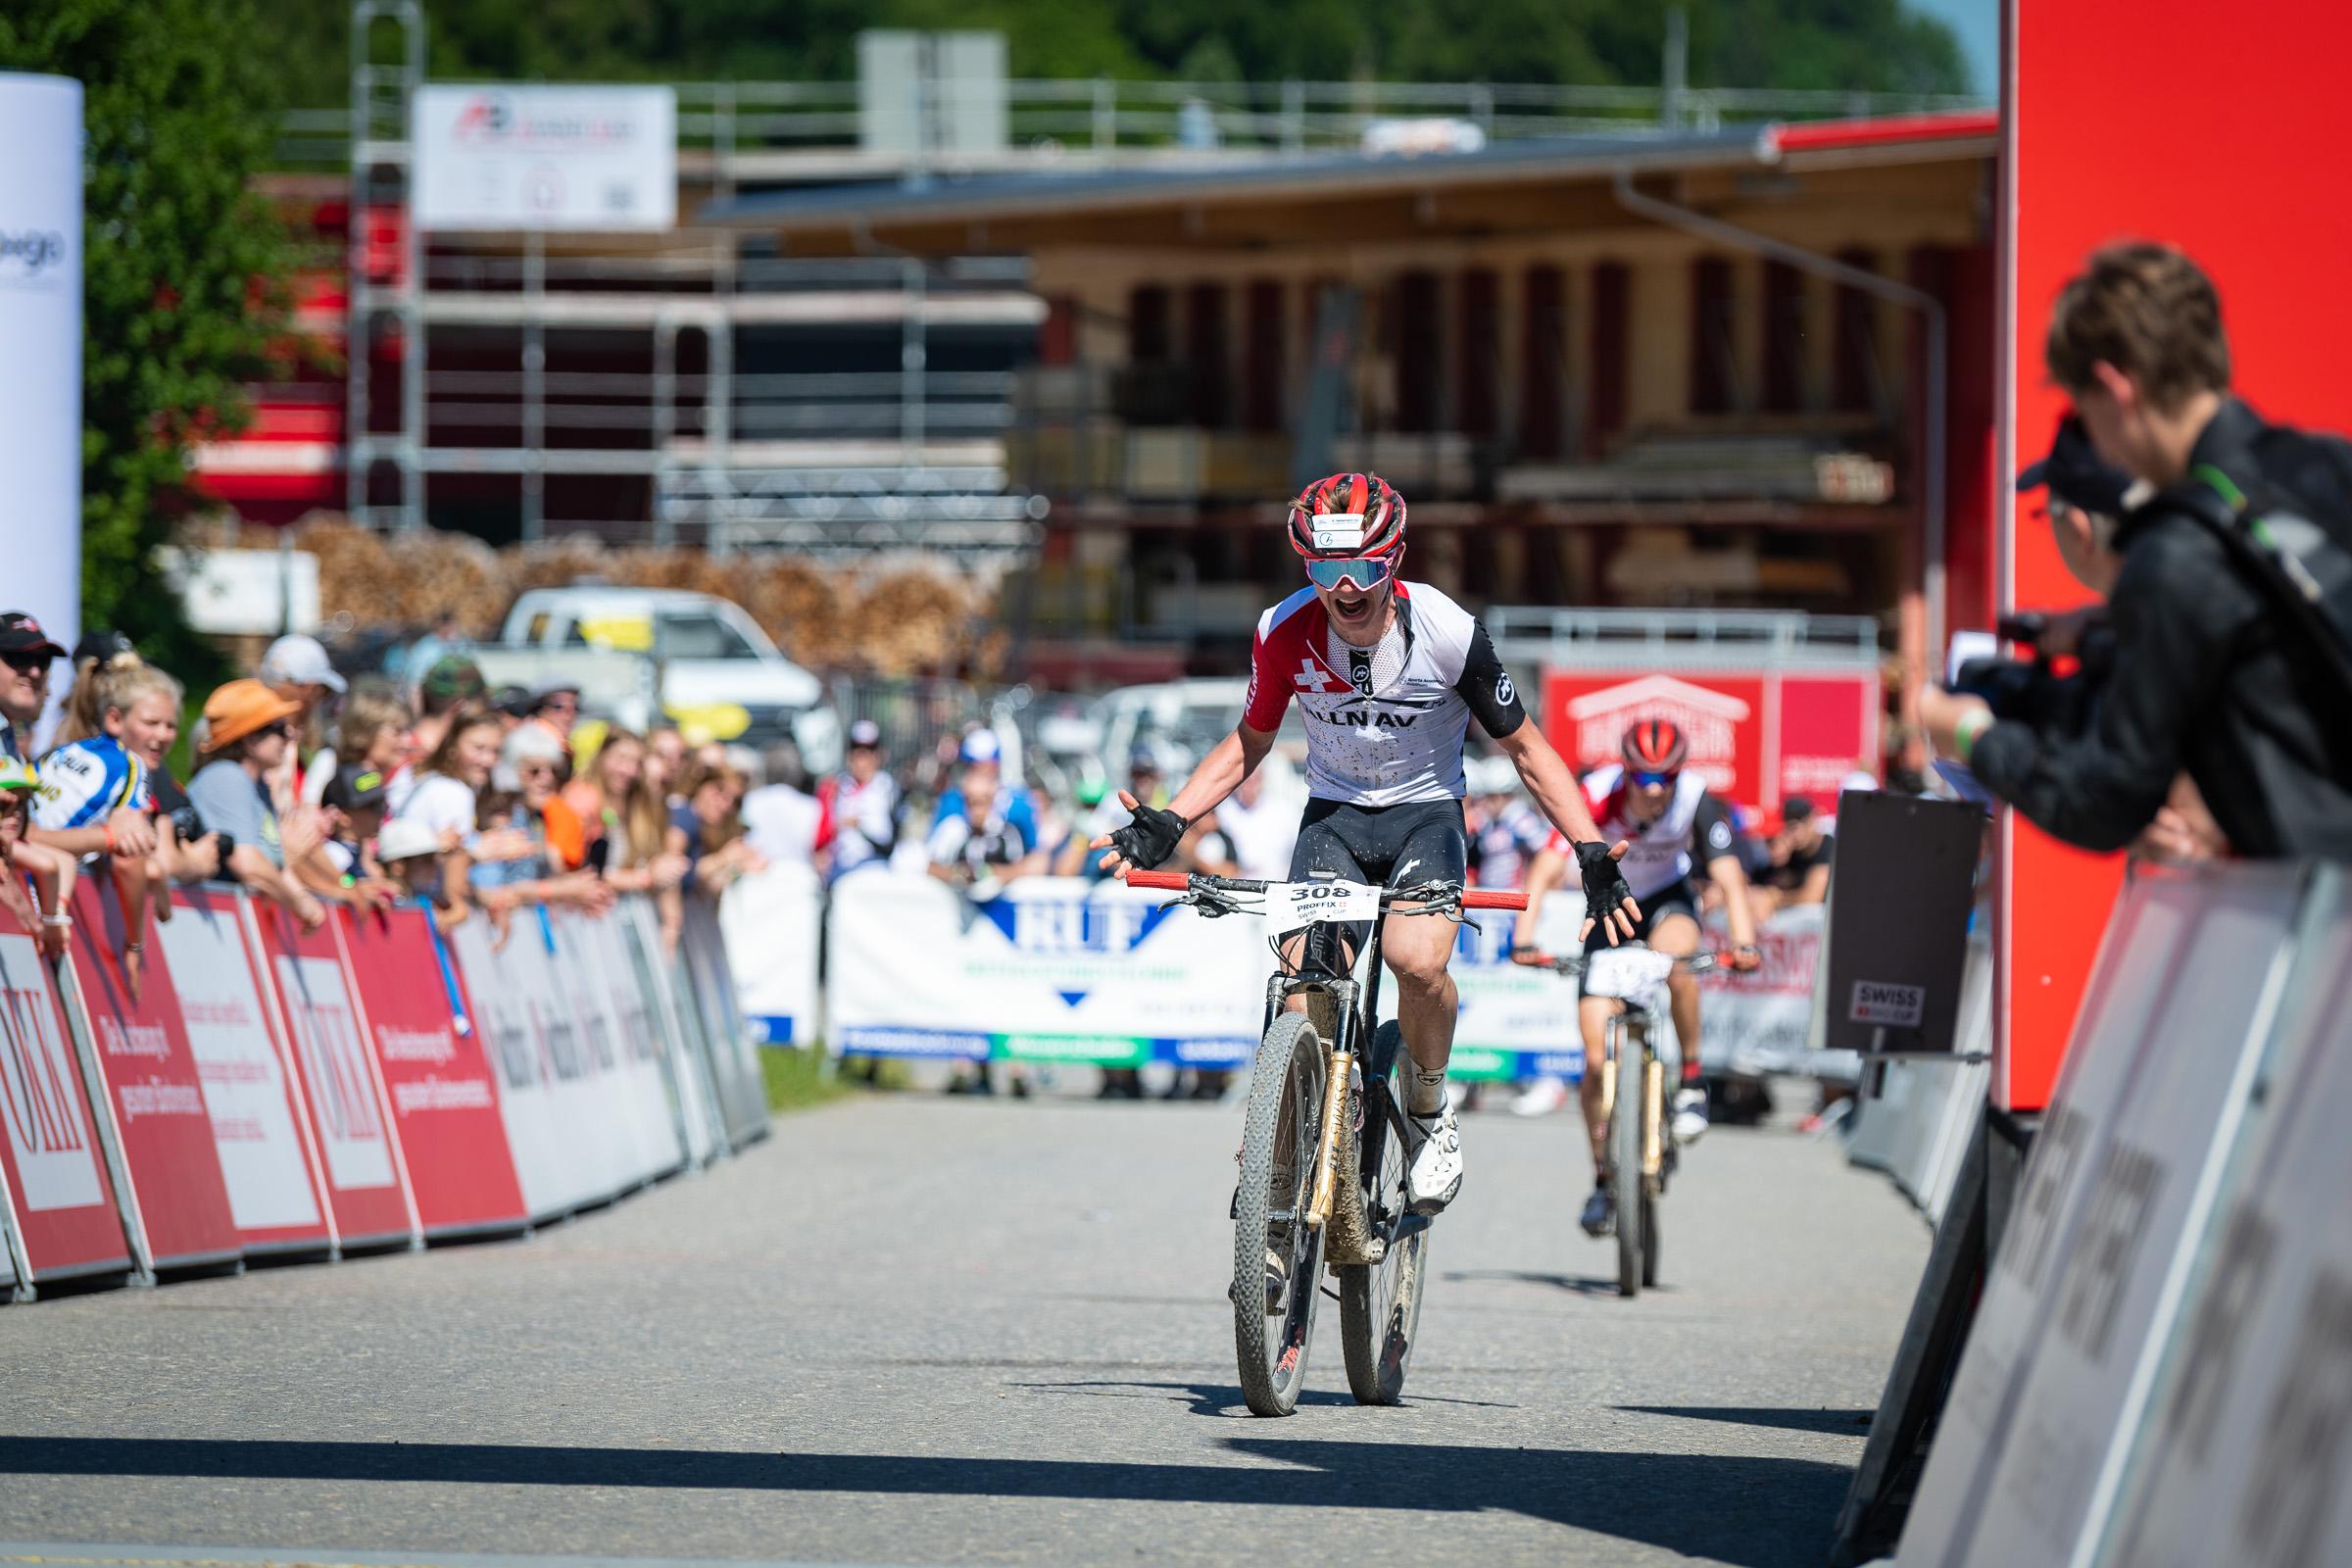 308, Kull, Robin, Bike Team Solothurn, VBT Seetal, SUI